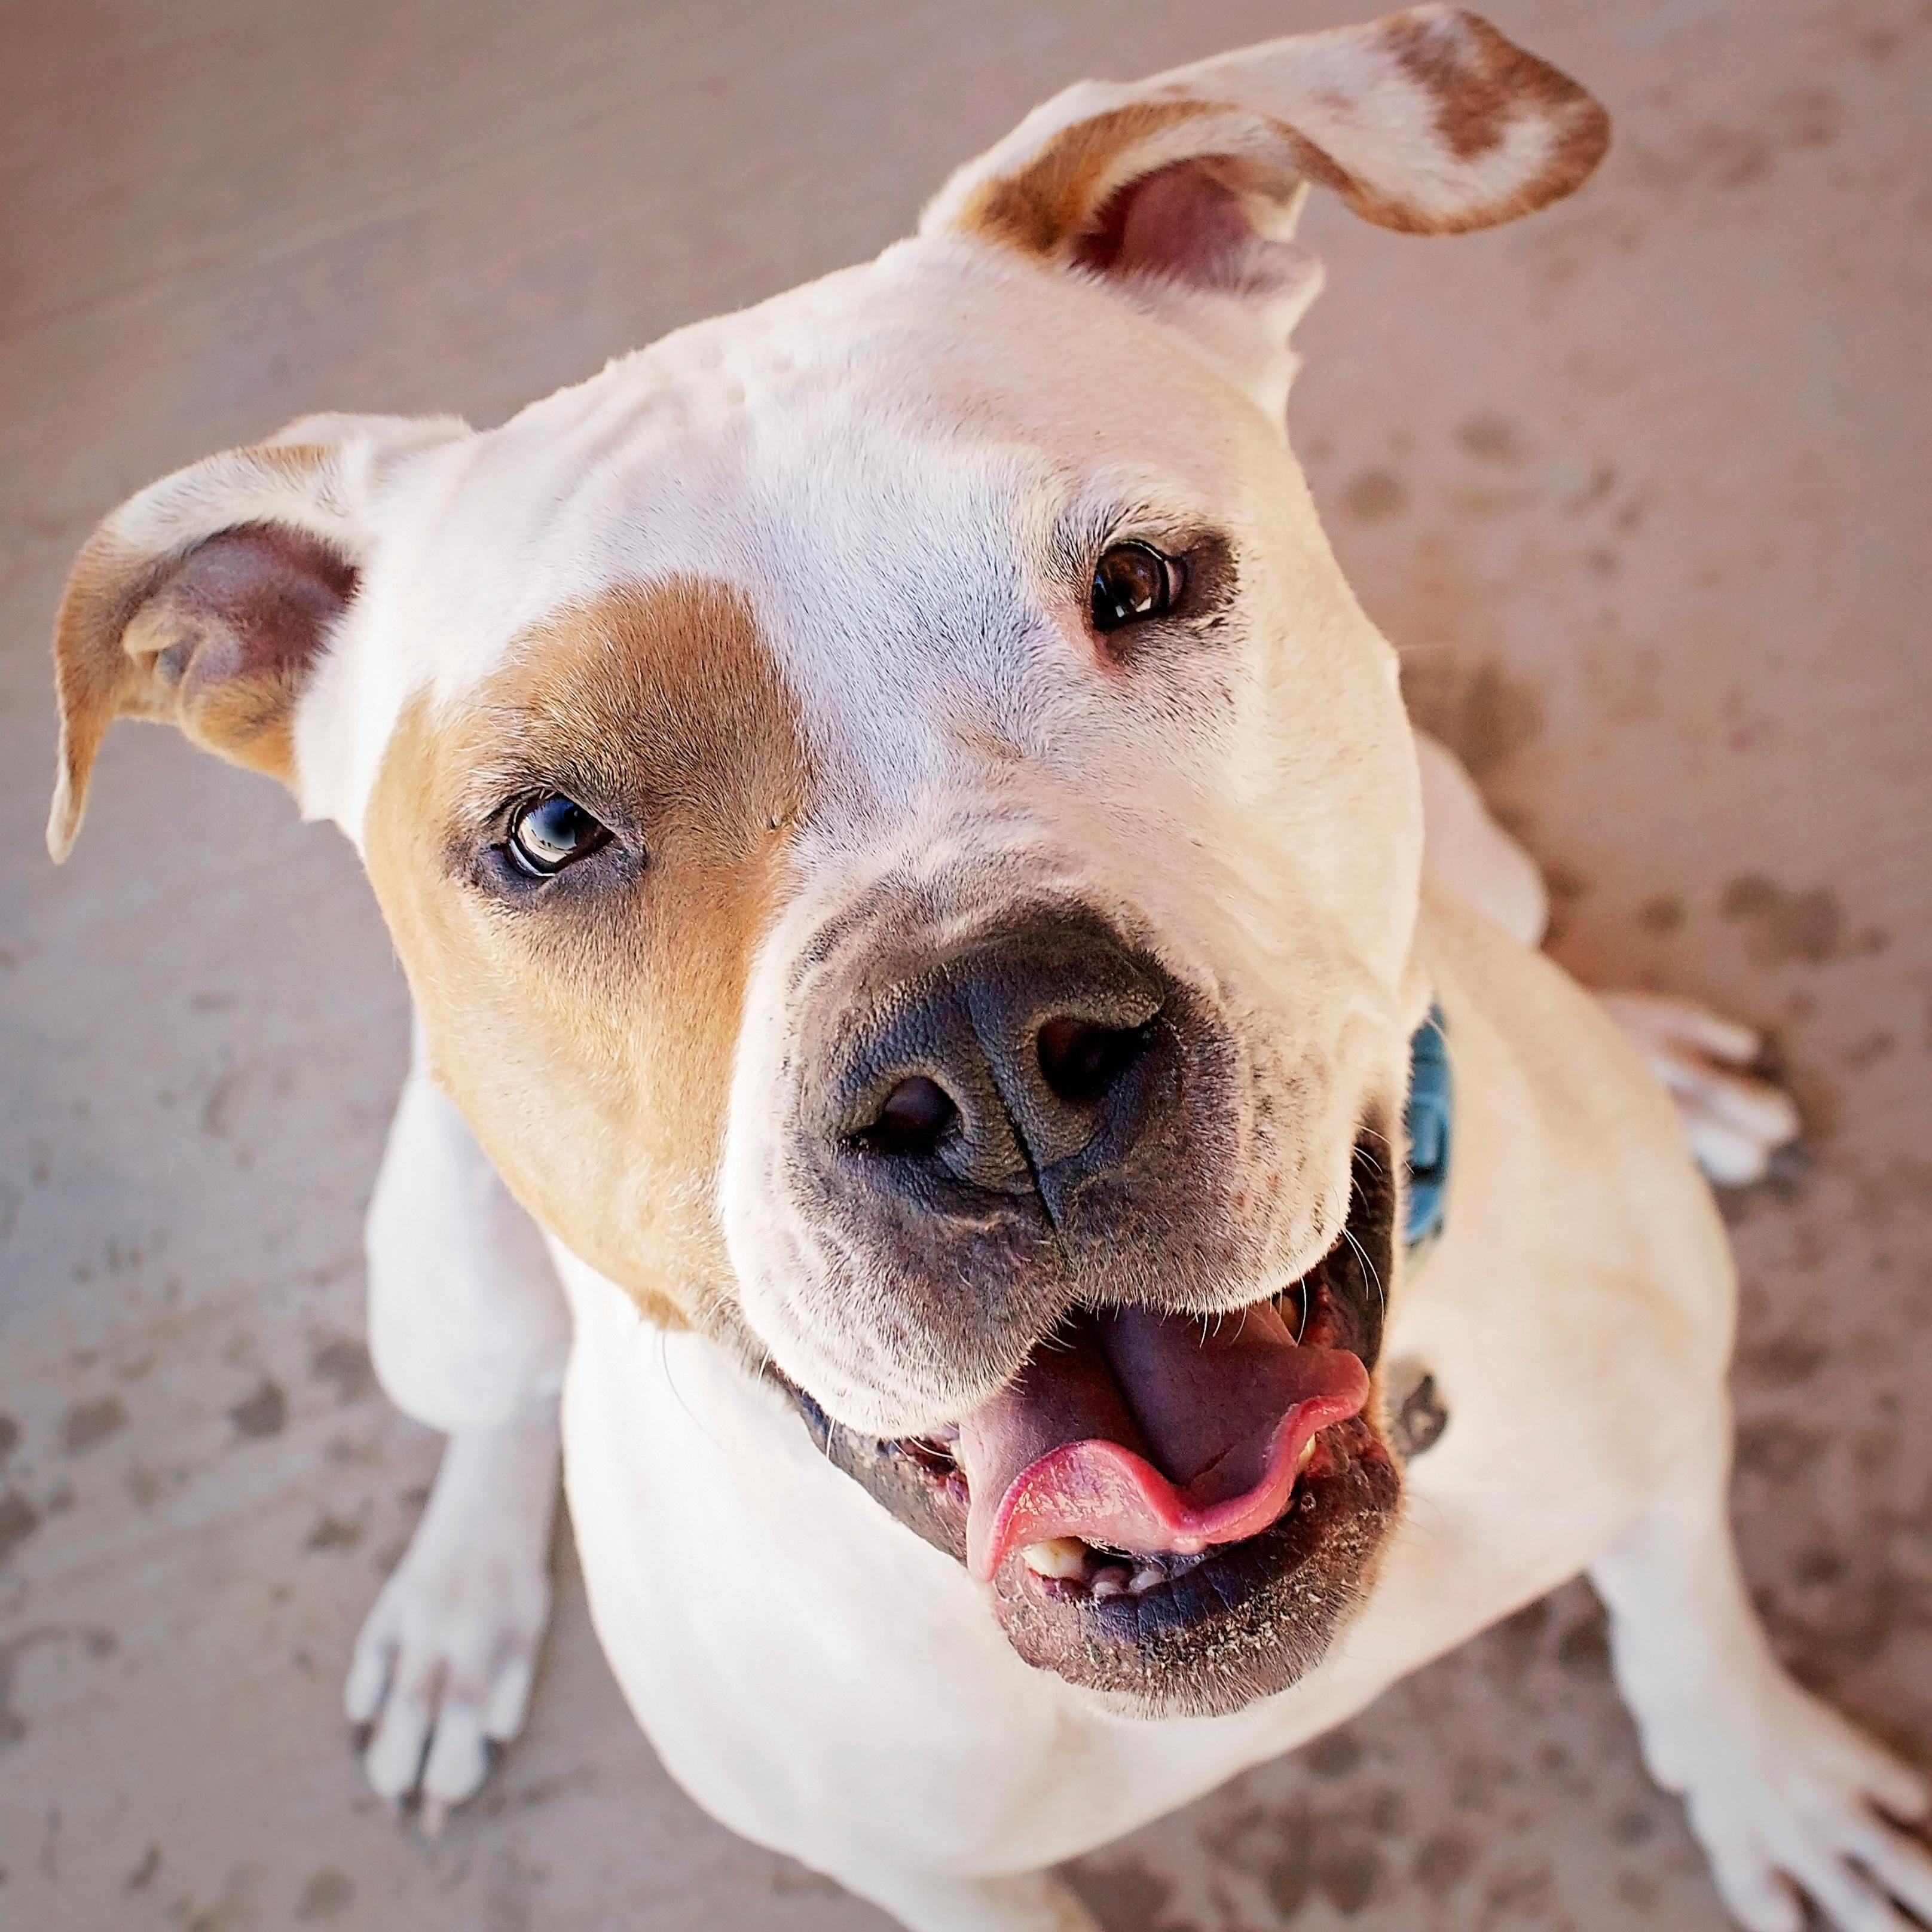 American Bulldog dog for Adoption in Peoria, AZ. ADN